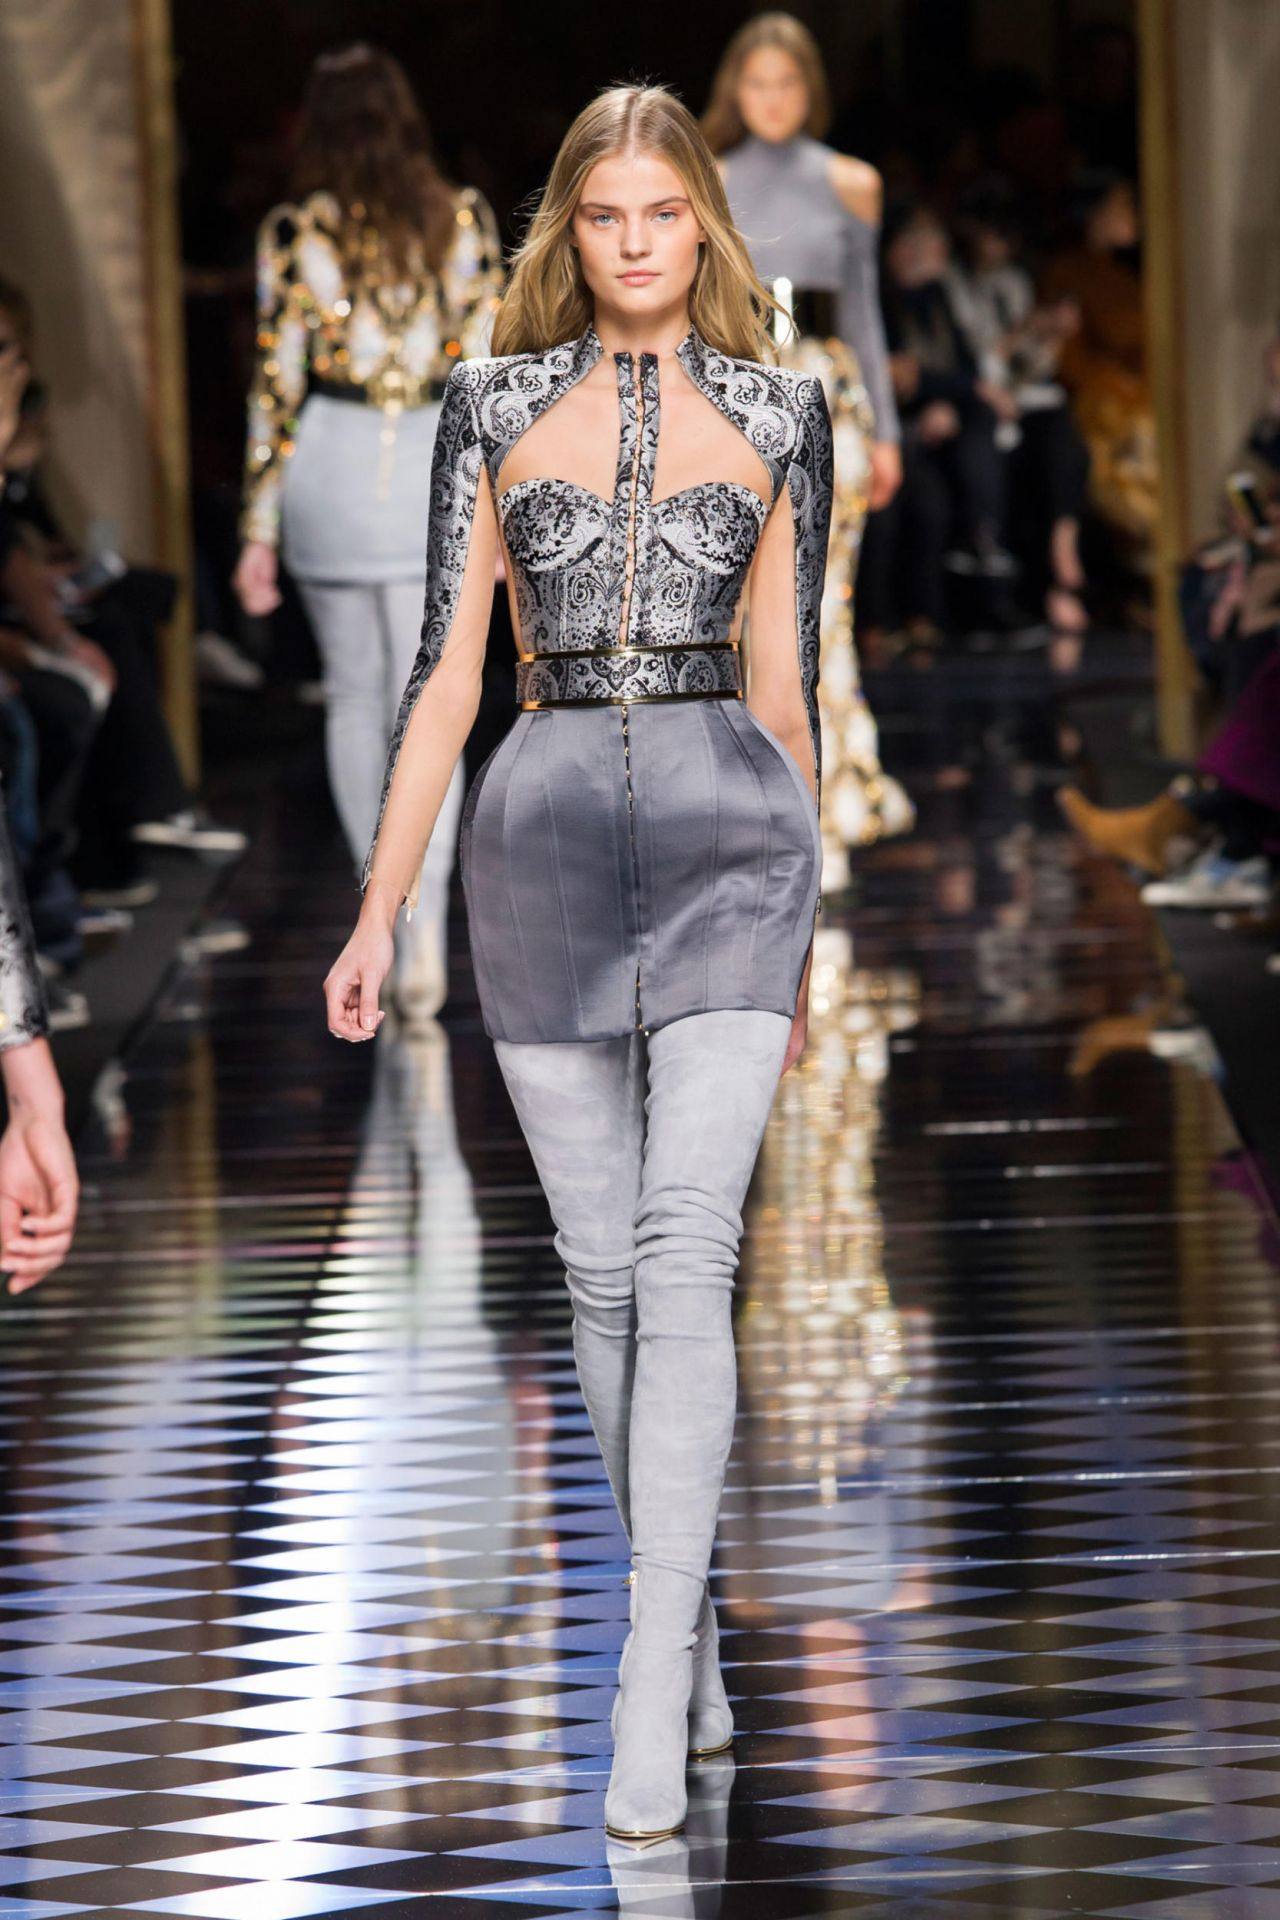 Kate Grigorieva Balmain Show Paris Fashion Week March 2016